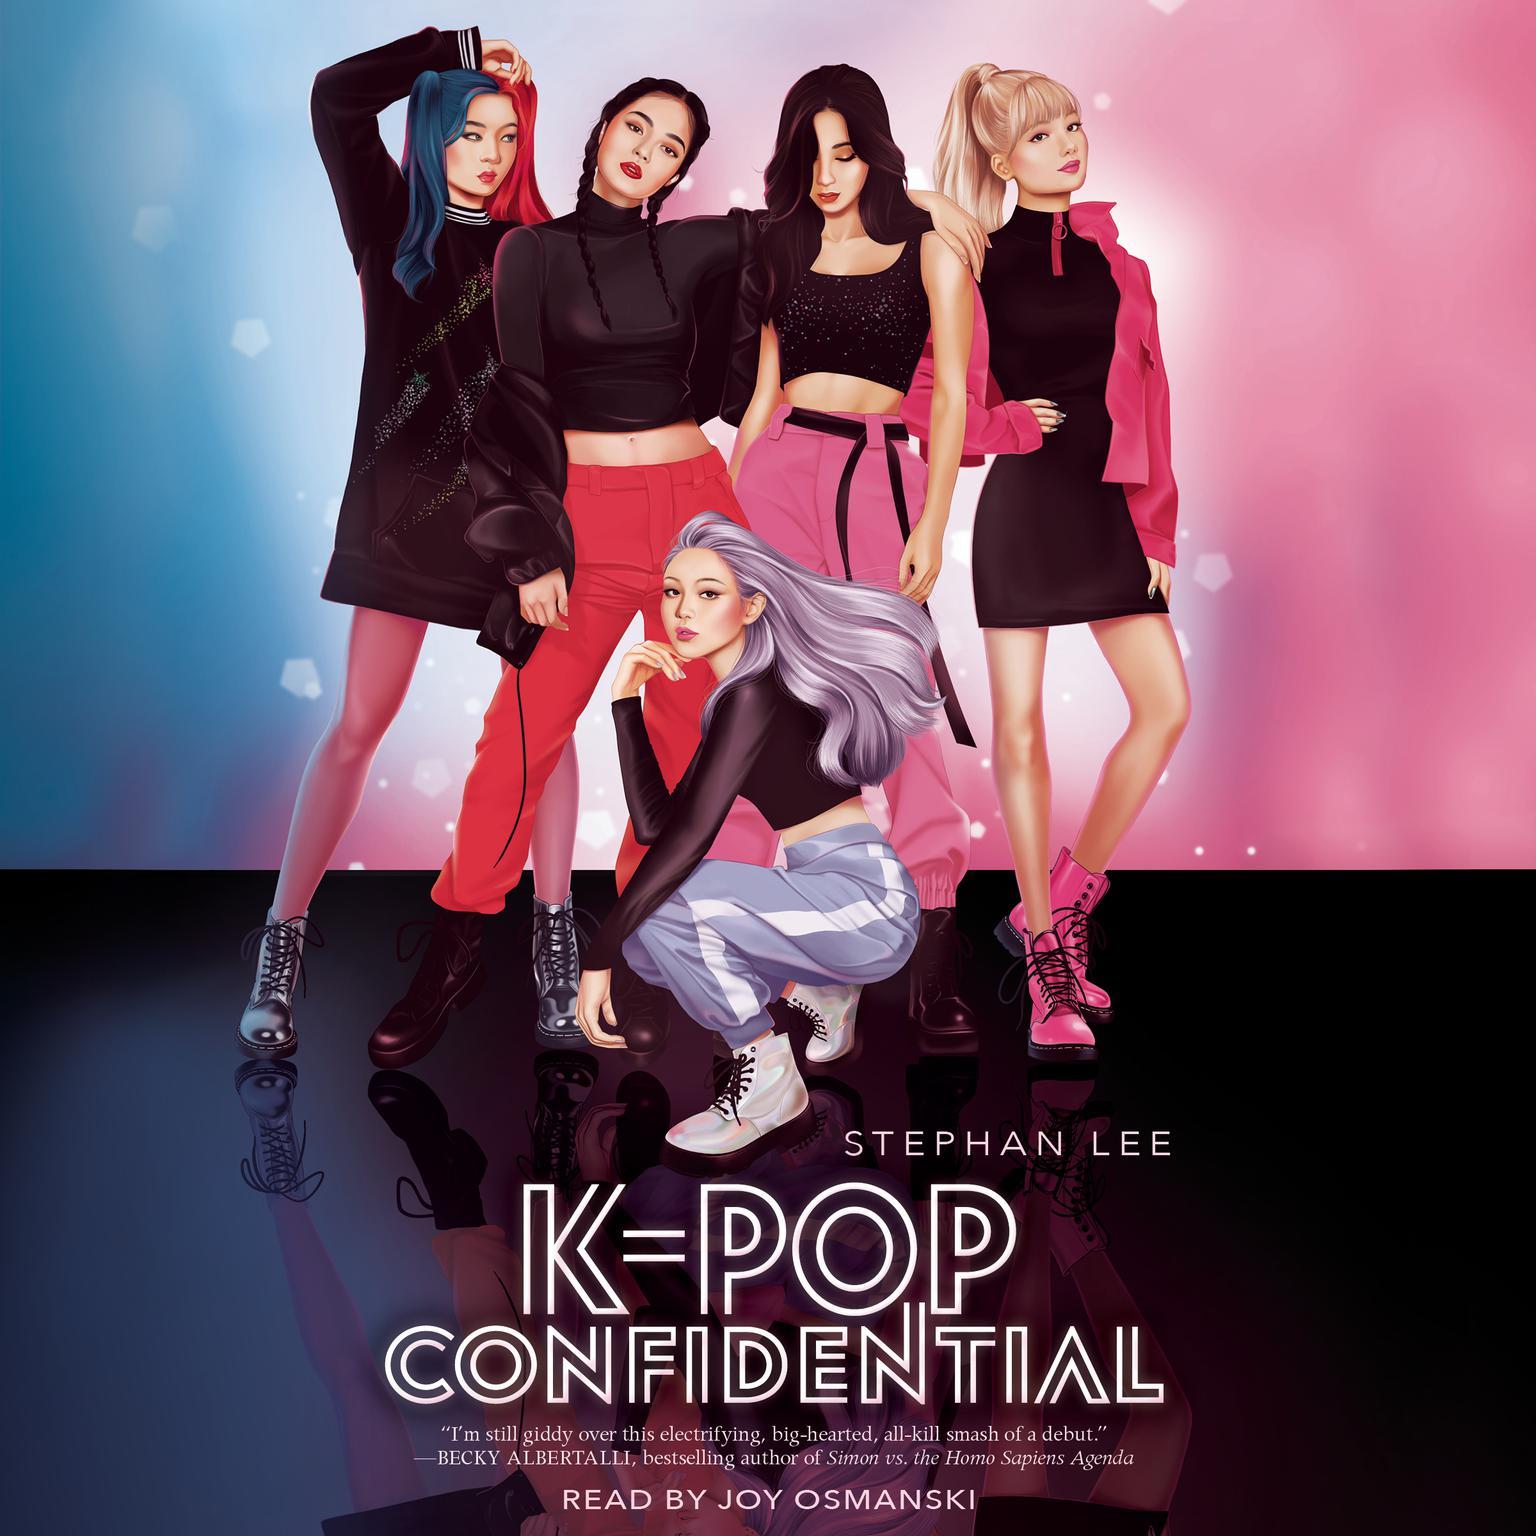 K-Pop Confidential cover art